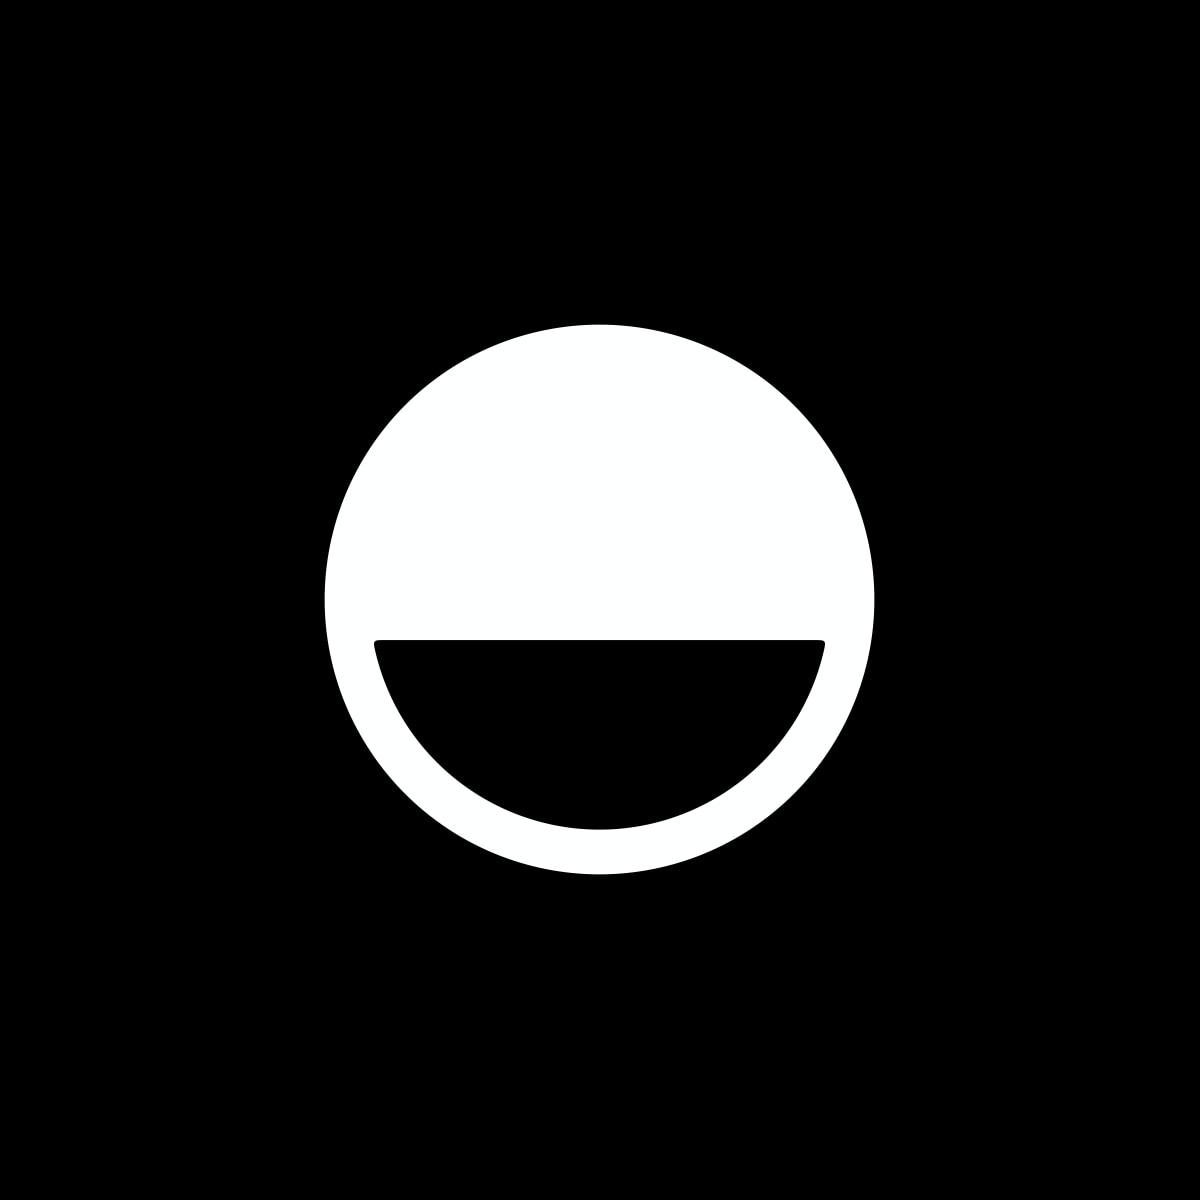 Go to Fujifeed's profile